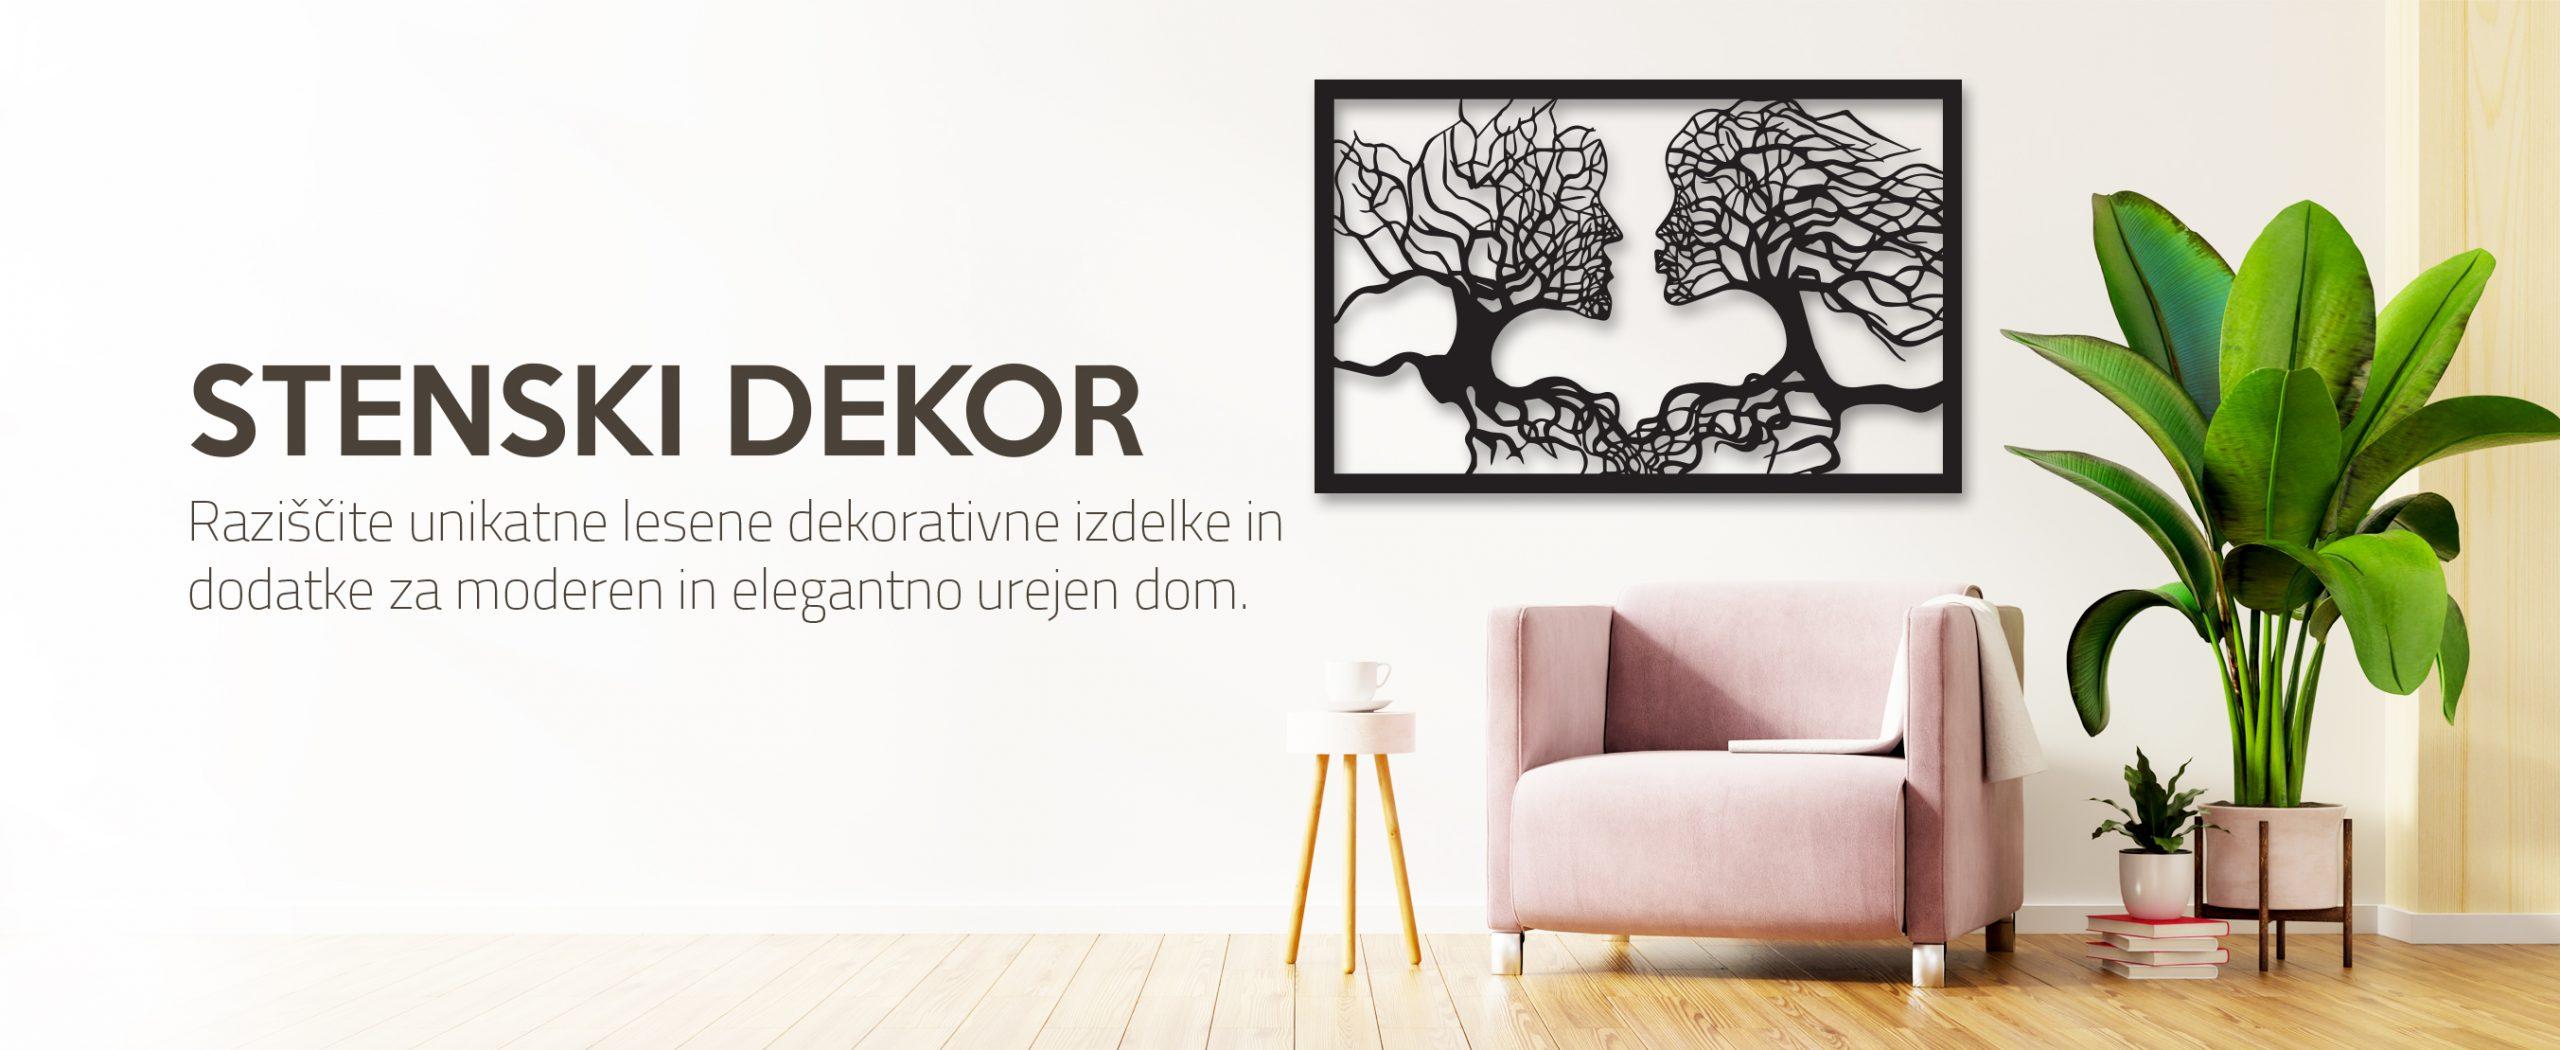 stenski_dekor_slider_svetlejši